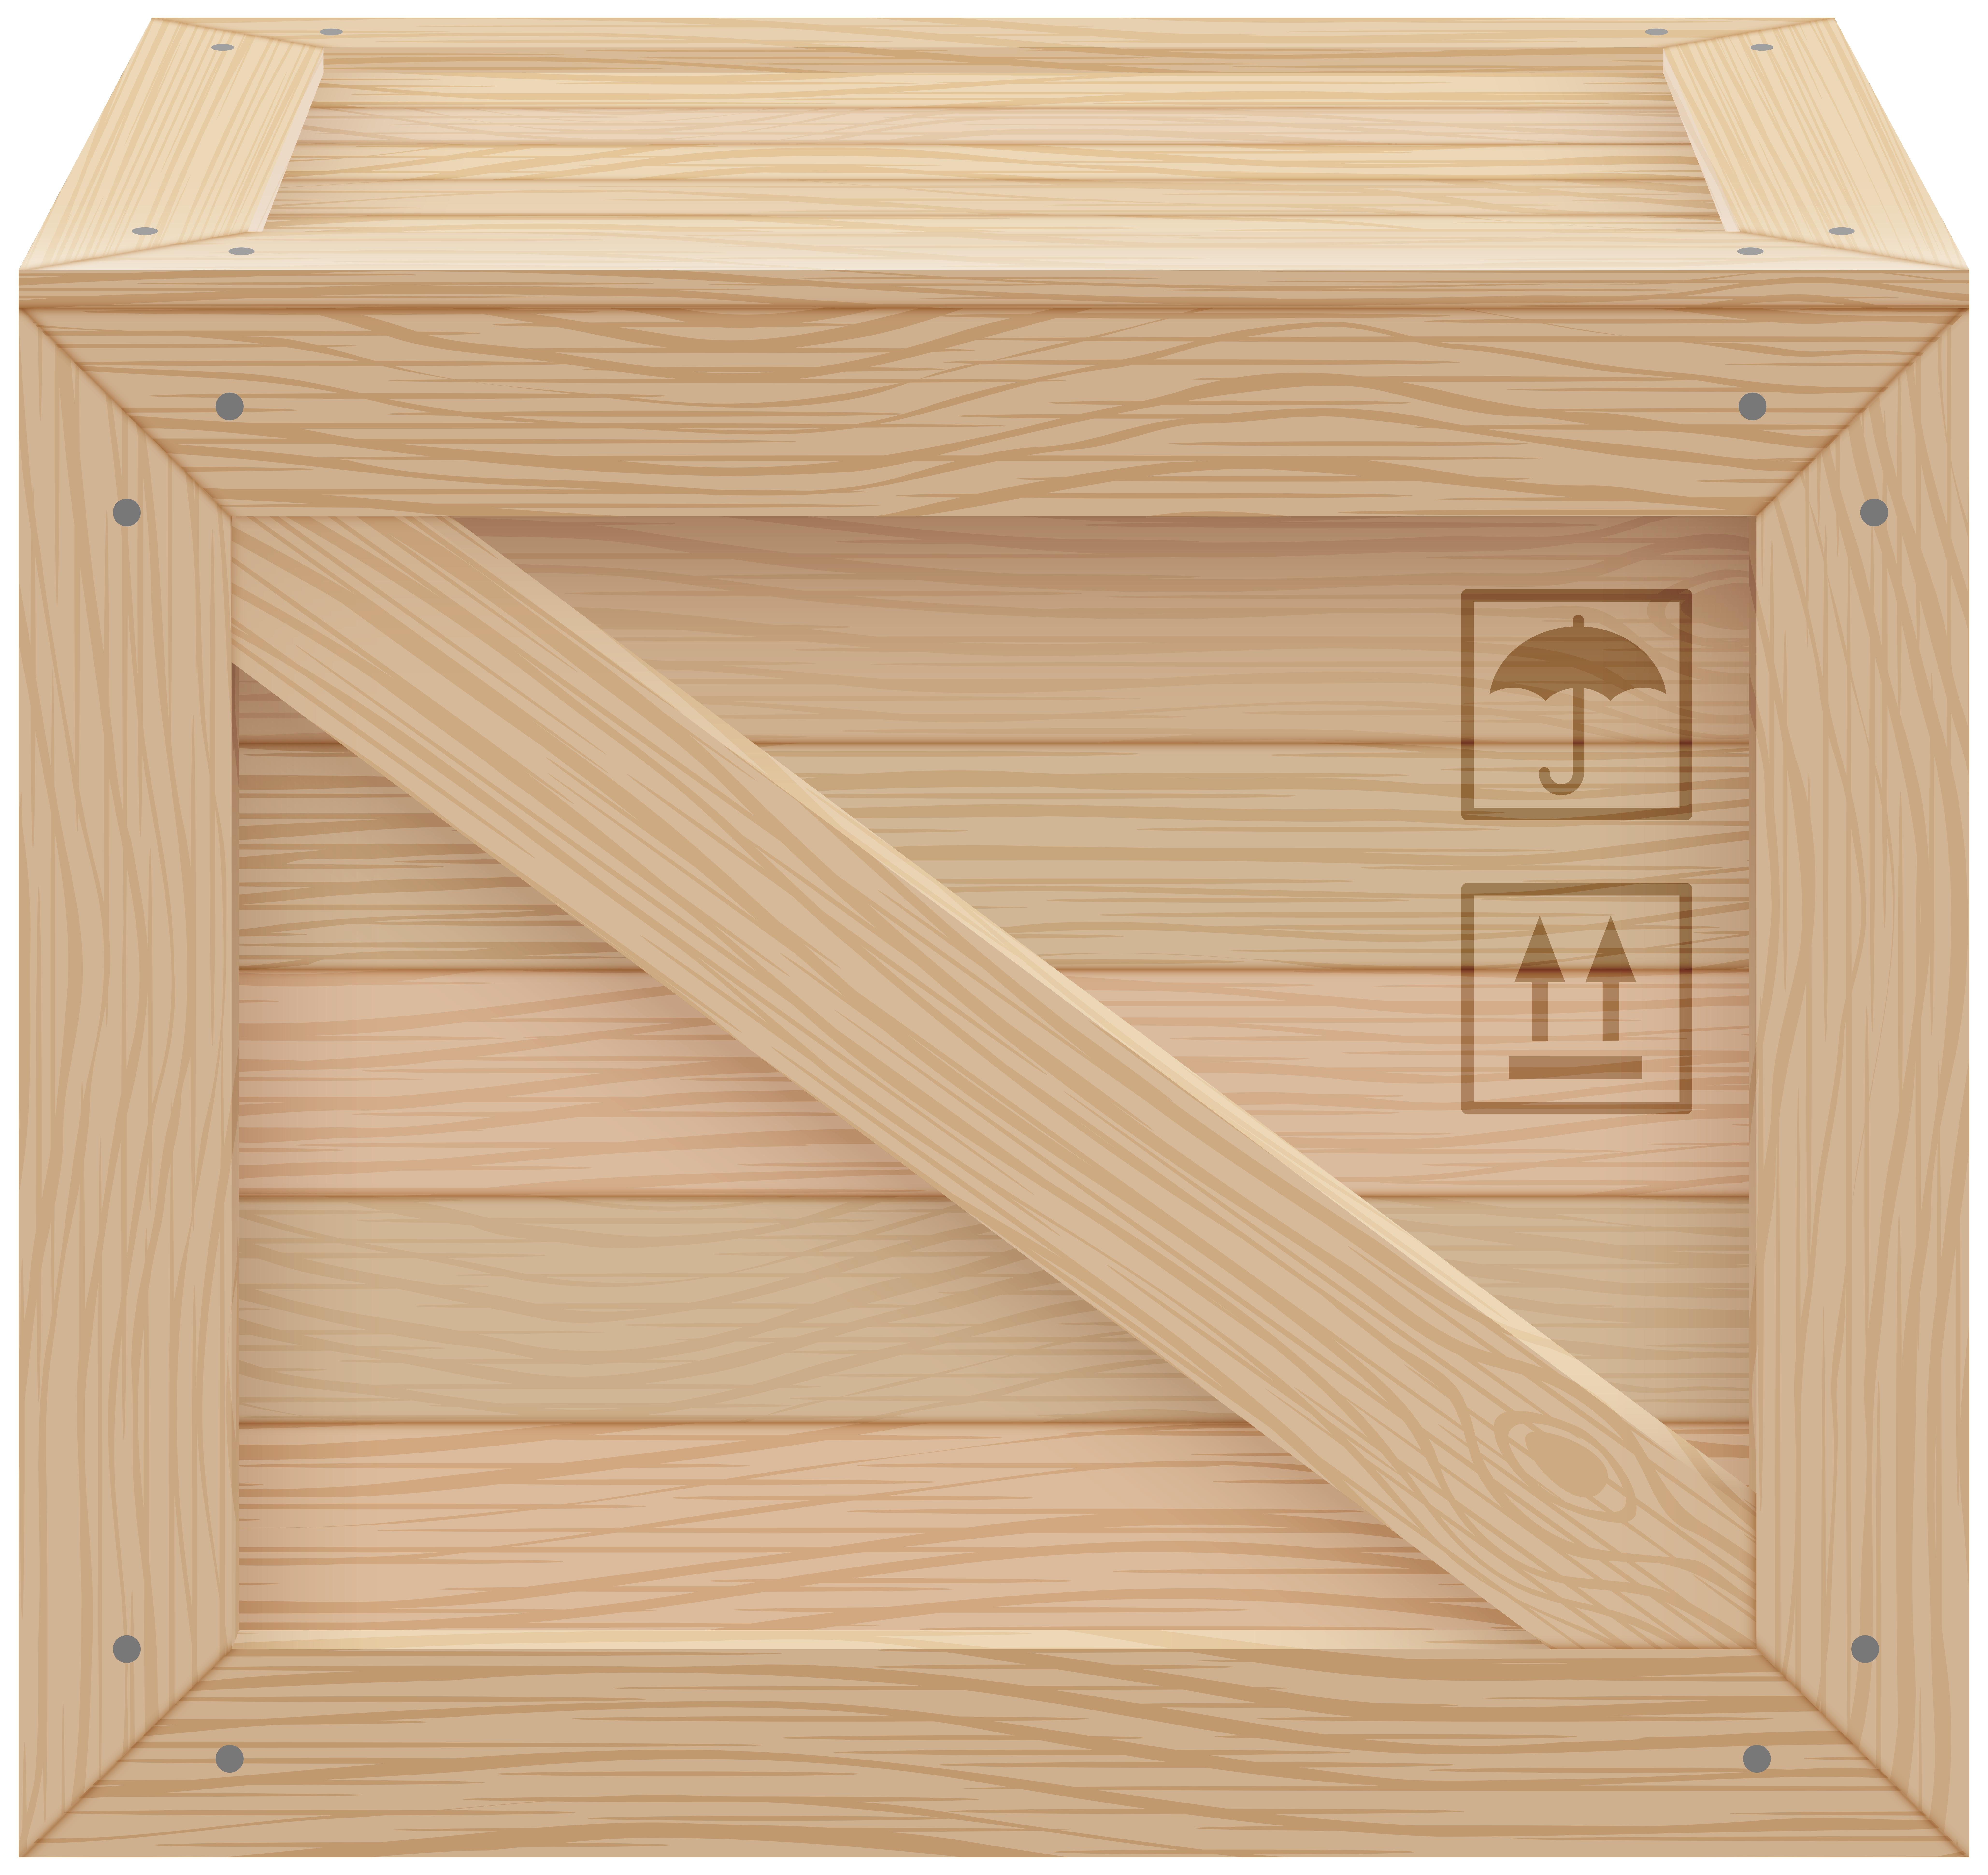 Box clipart crate. Png clip art best